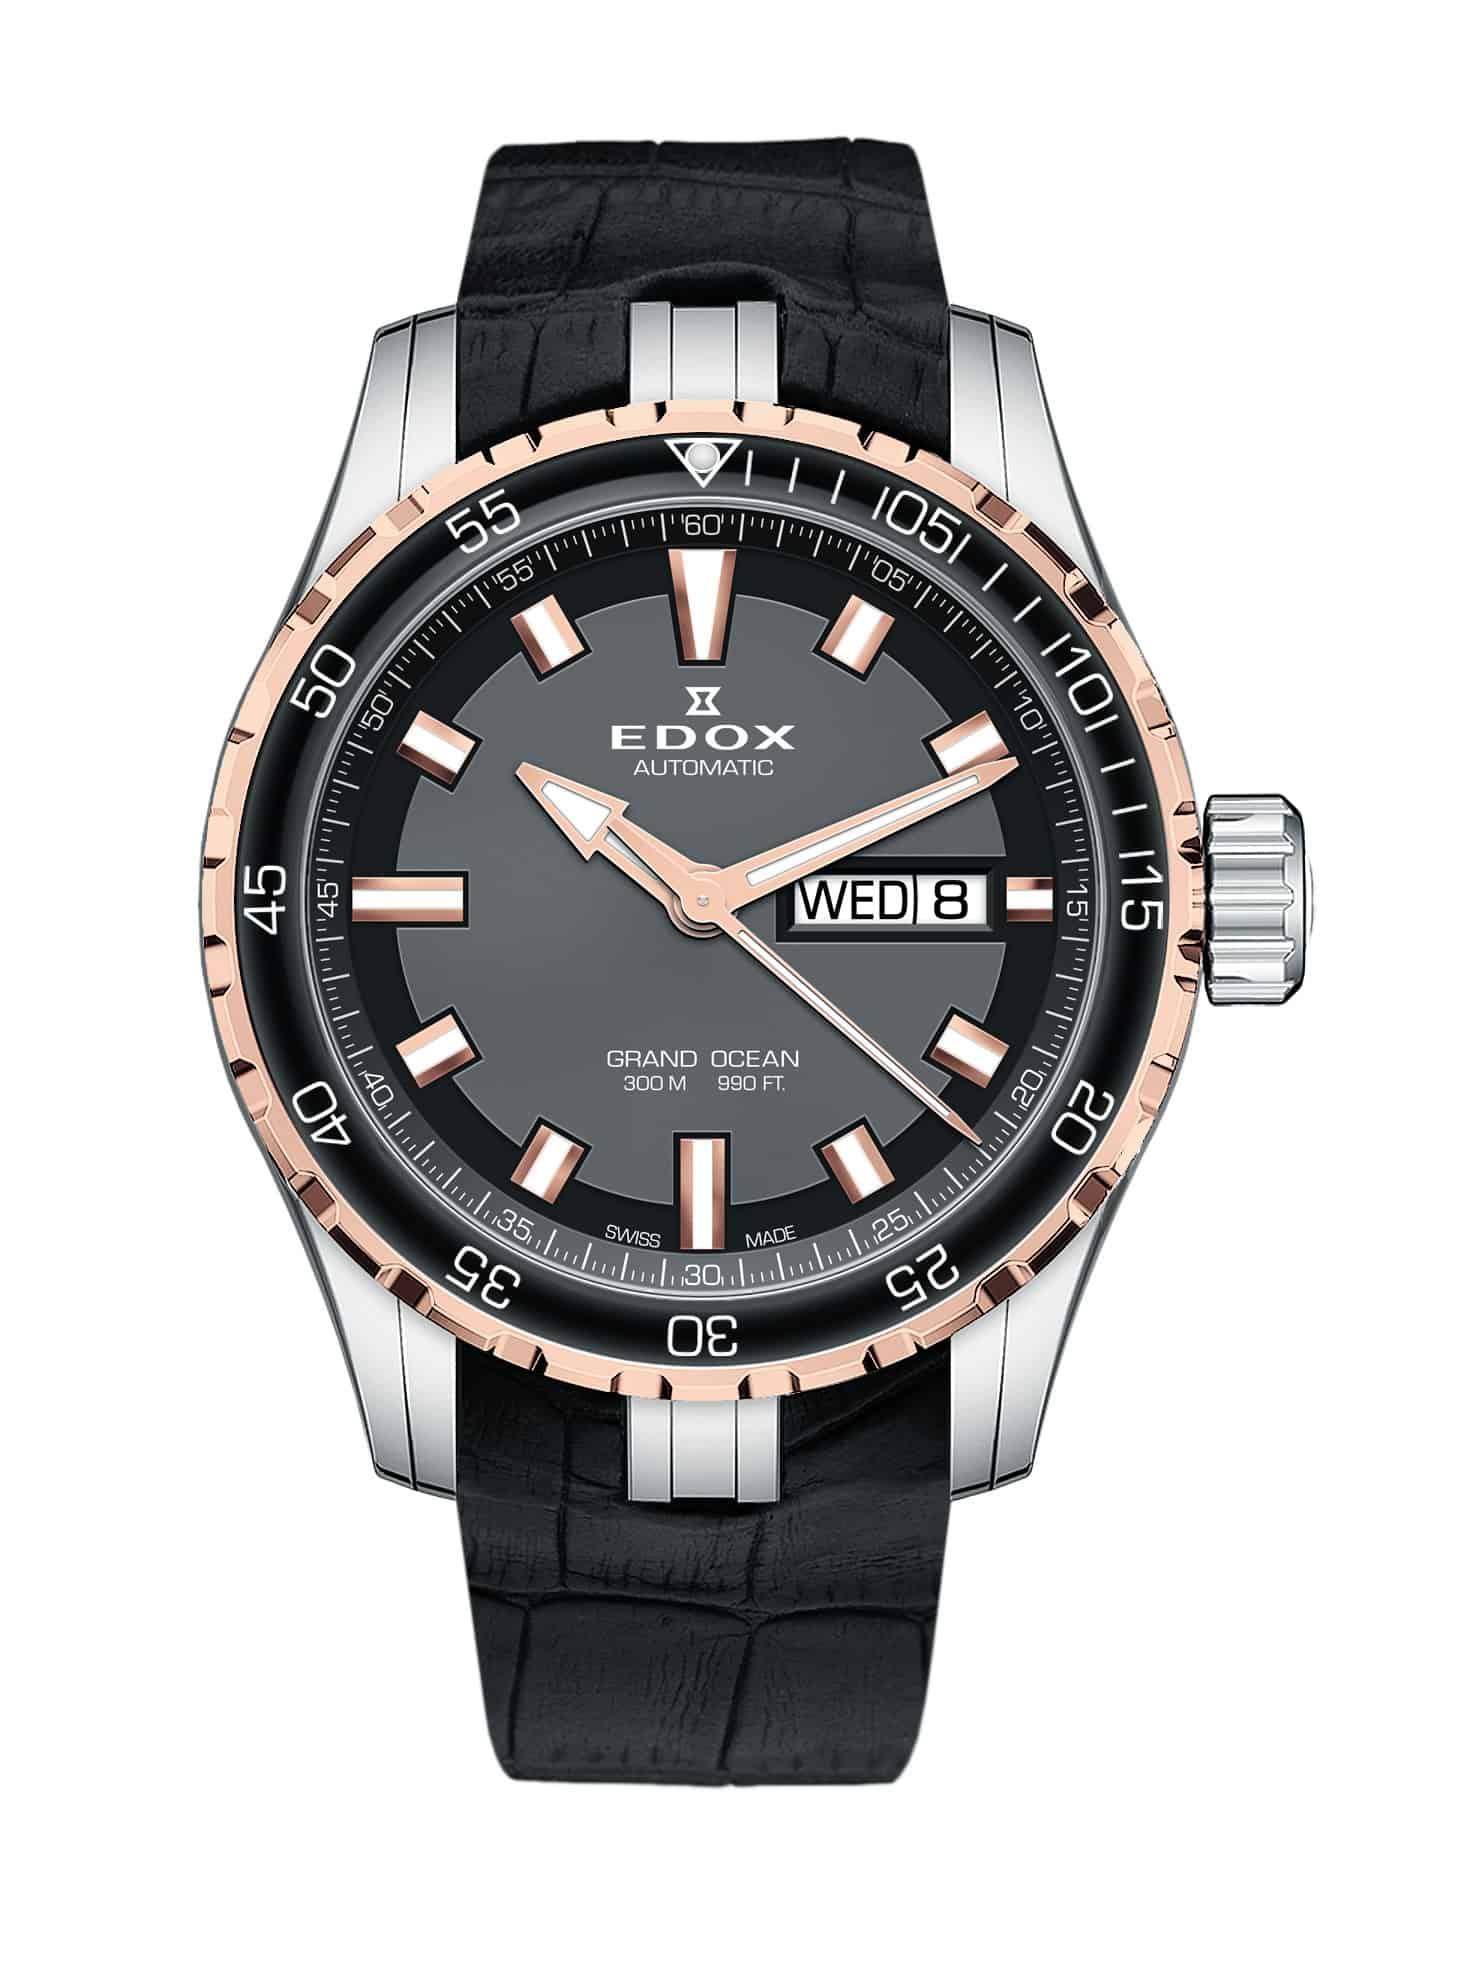 Grand Ocean Automatic 88002 357RC NIR